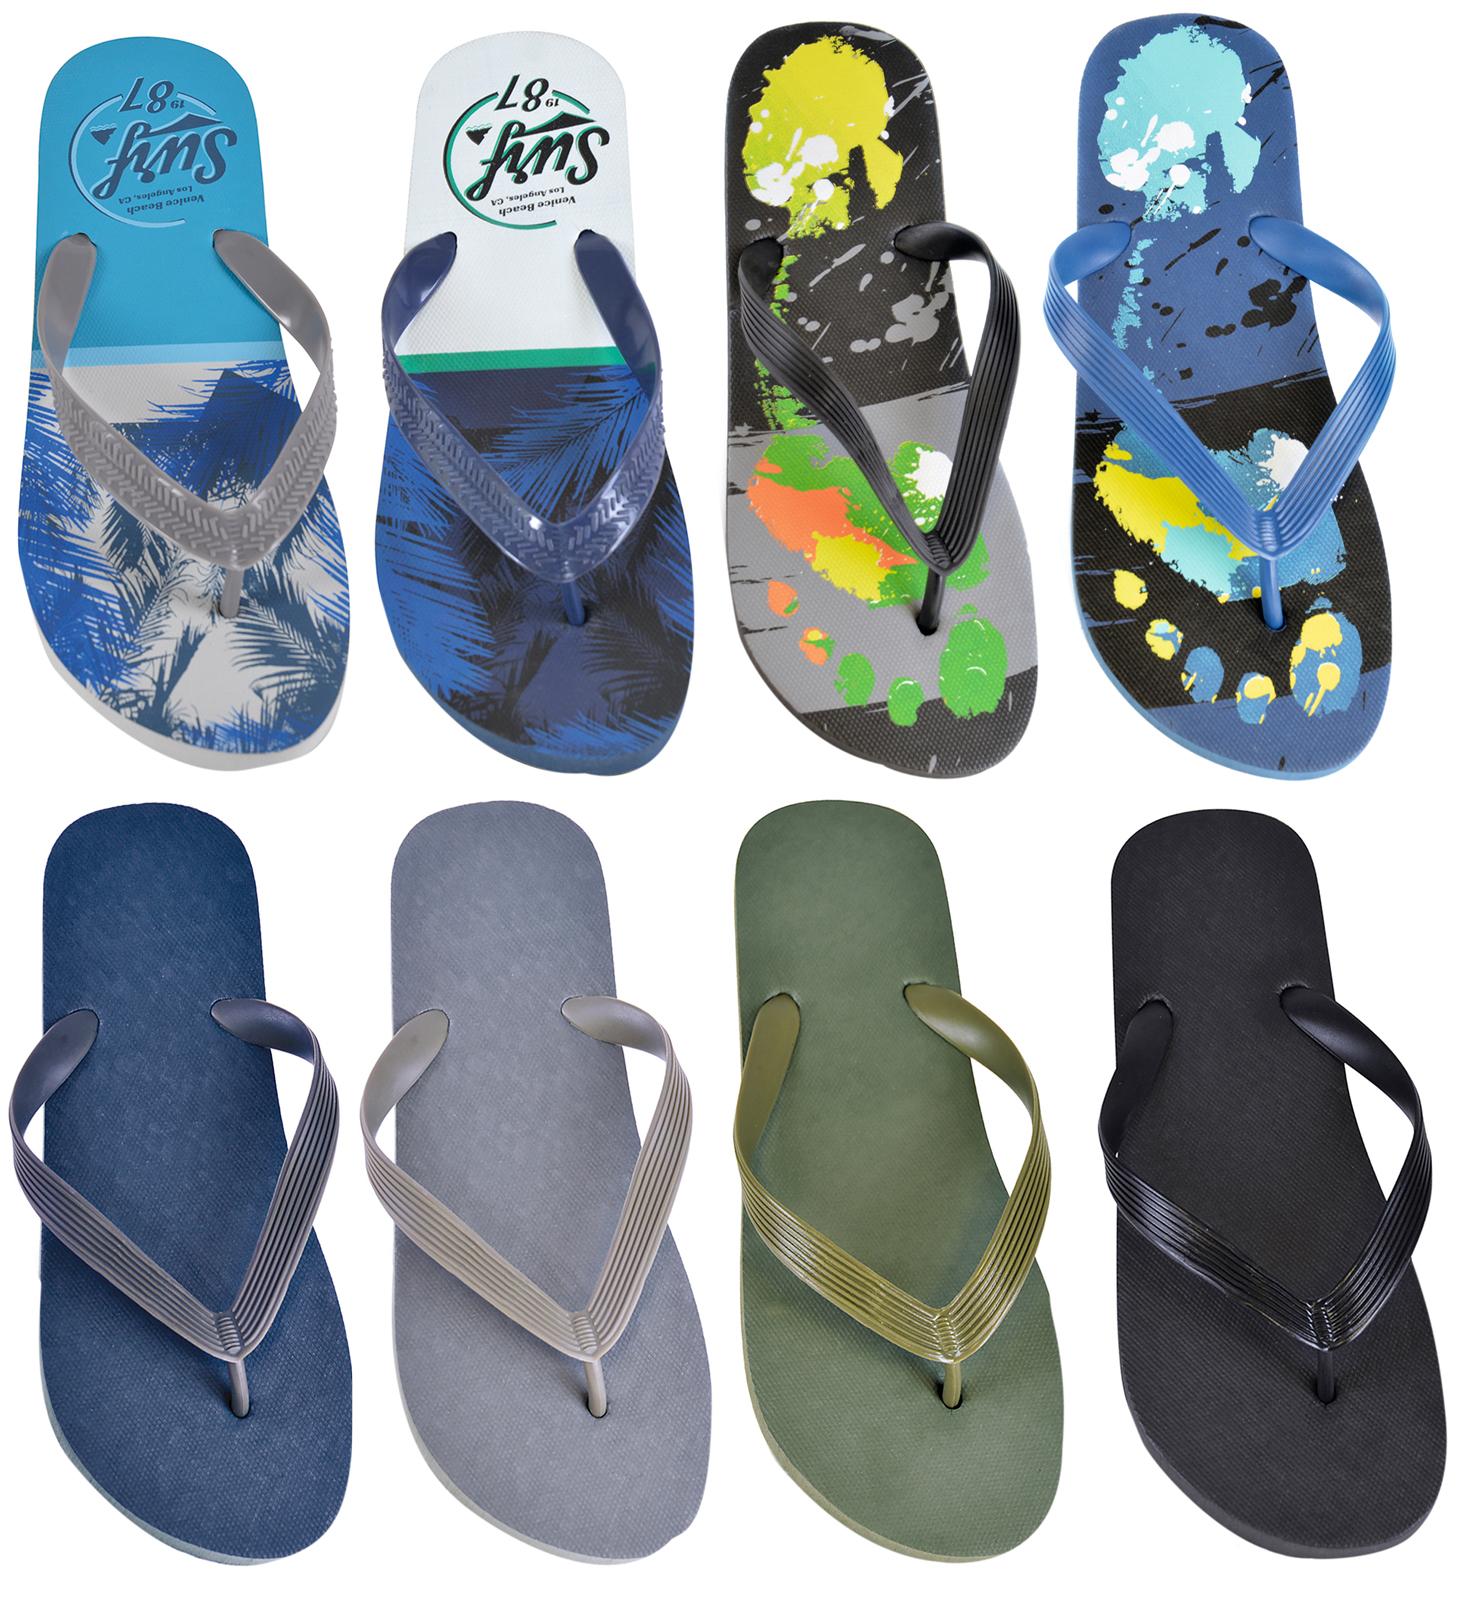 63e4ff6552d5 Details about Mens Flip Flops Summer Sandals Flat Beach Holiday Pool Shoes  Shower Toe Posts